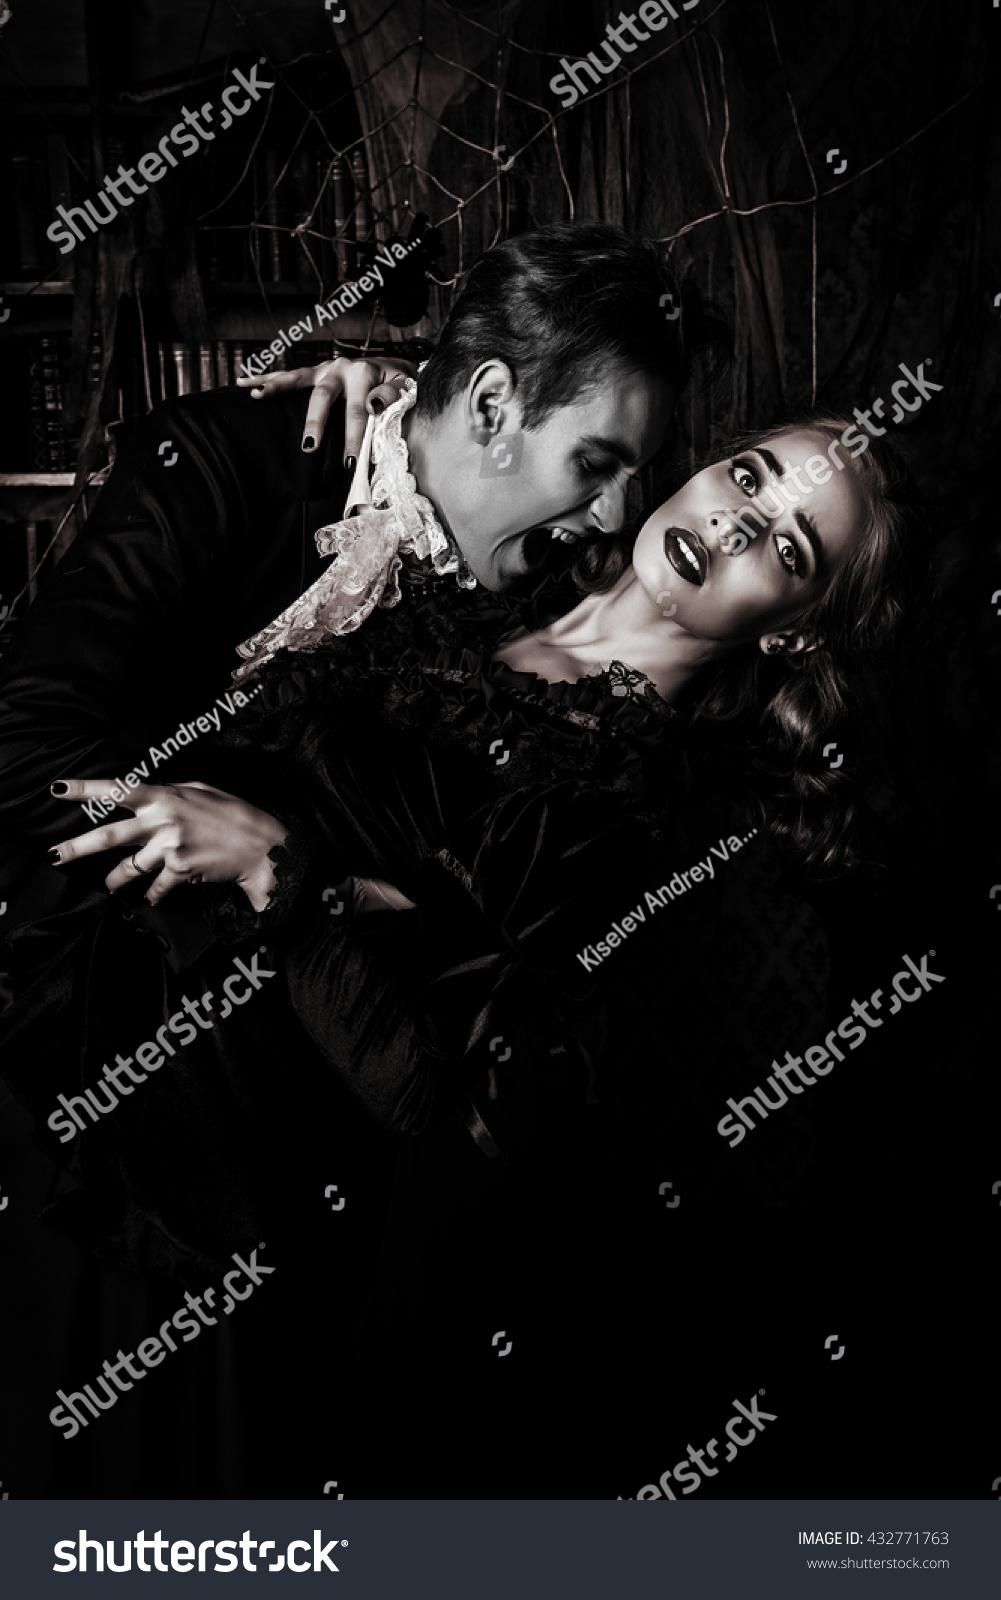 vampires biting people - photo #35